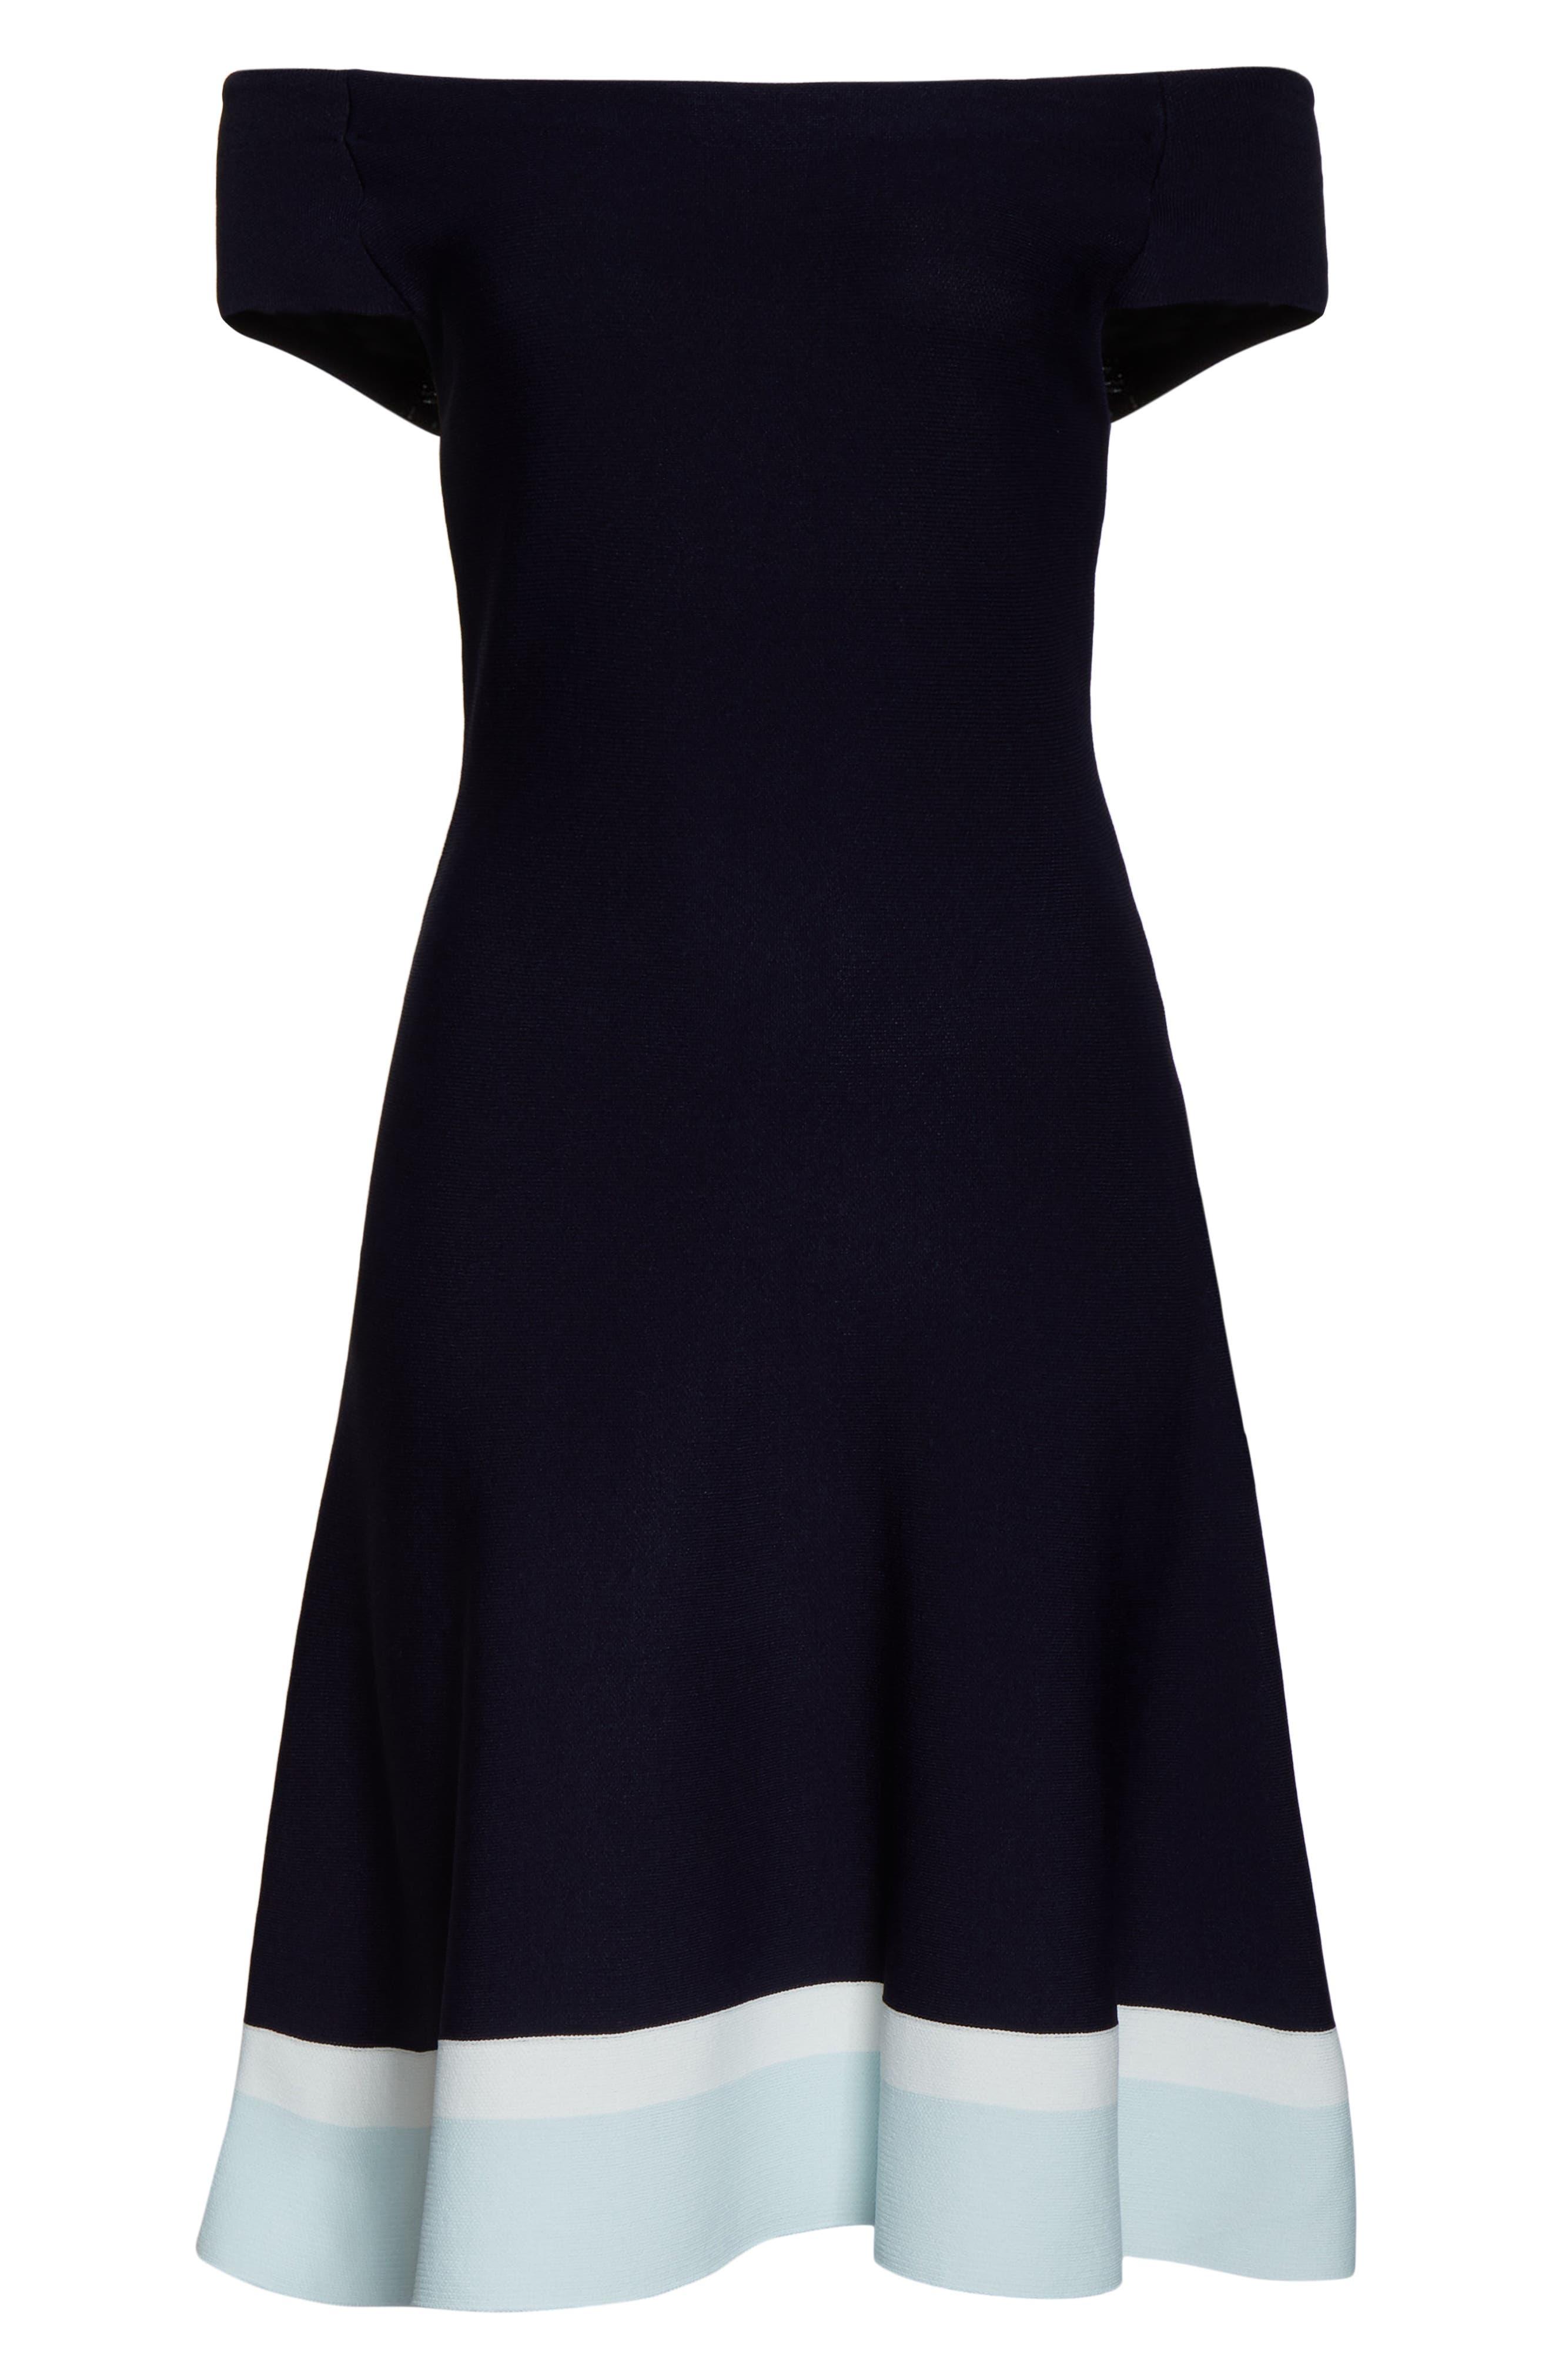 ELIZA J,                             Fit & Flare Knit Dress,                             Alternate thumbnail 7, color,                             BABY BLUE MULTI